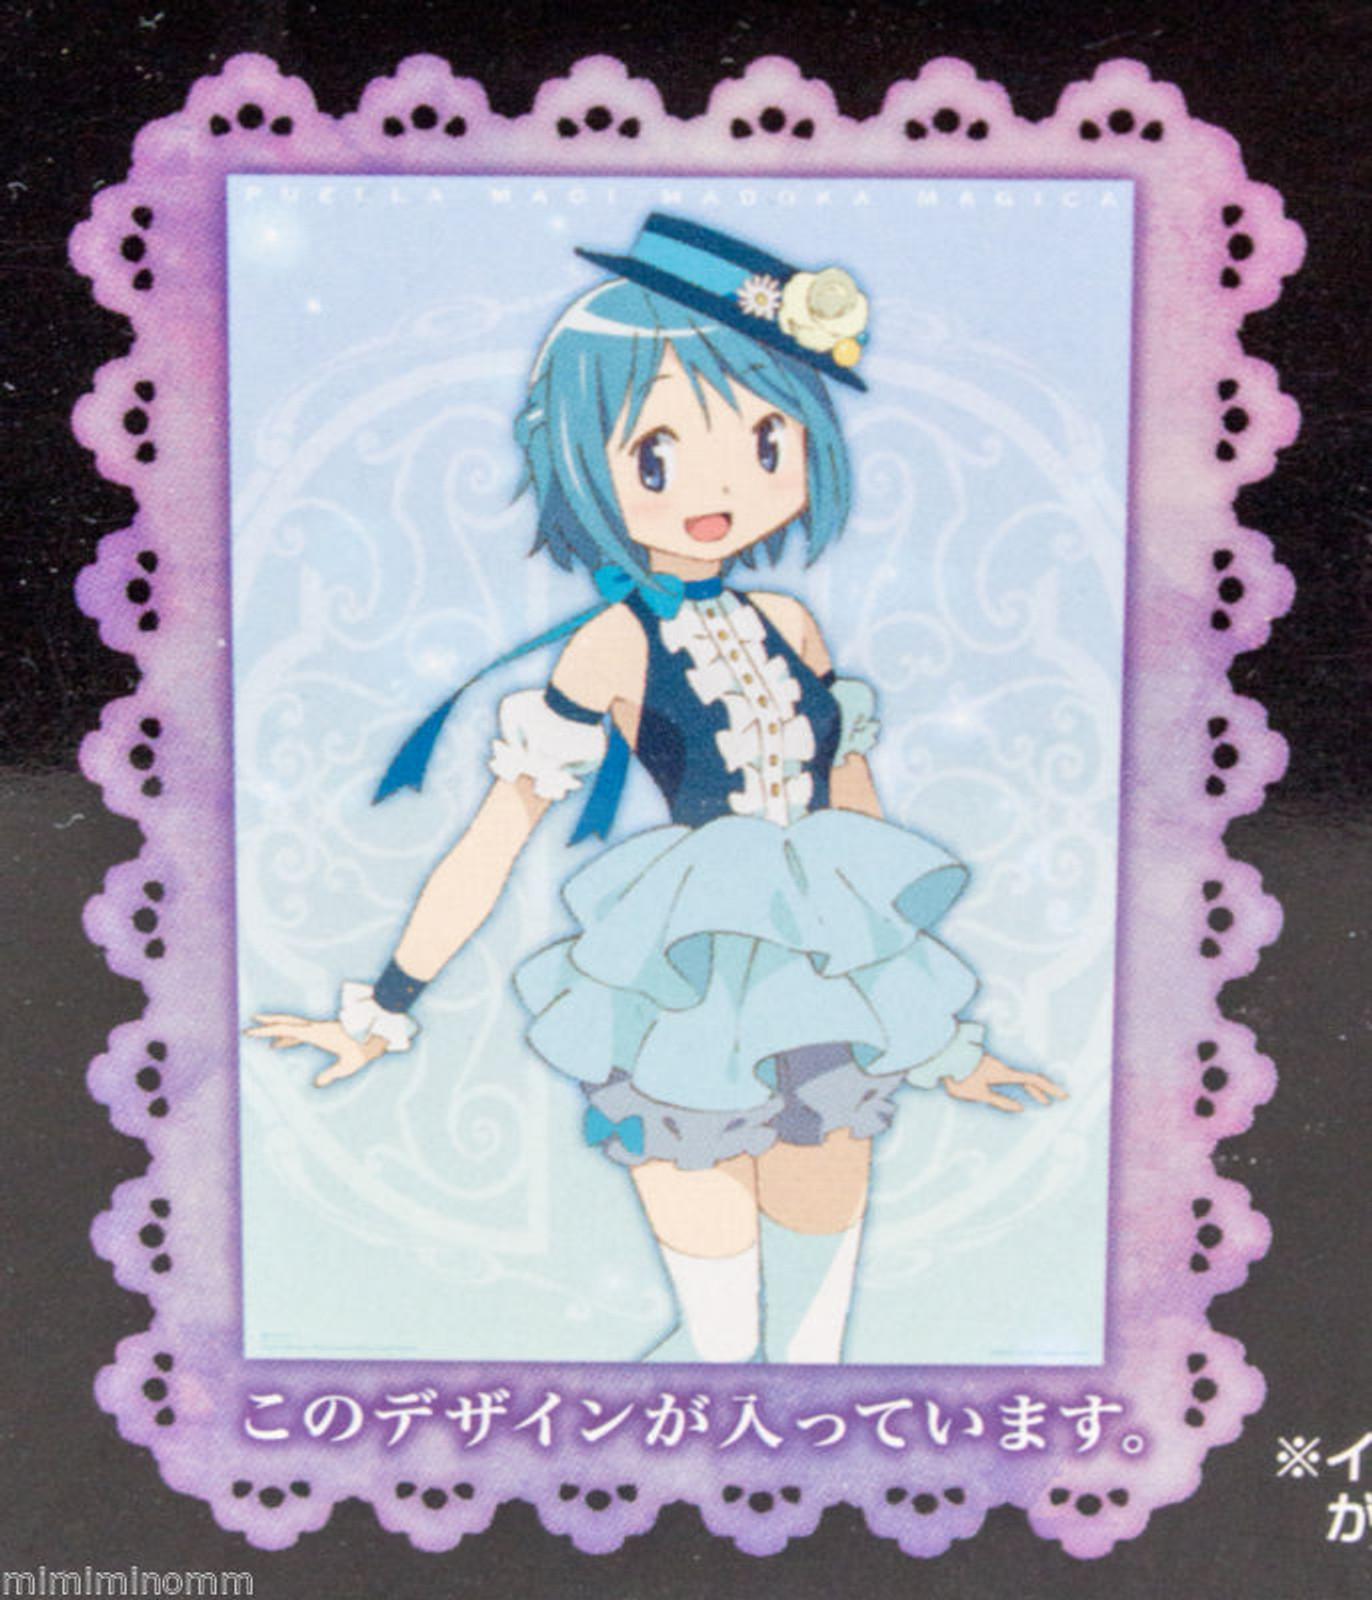 Puella Magi Madoka Magica Sayaka Miki A2 Size Poster Banpresto JAPAN ANIME